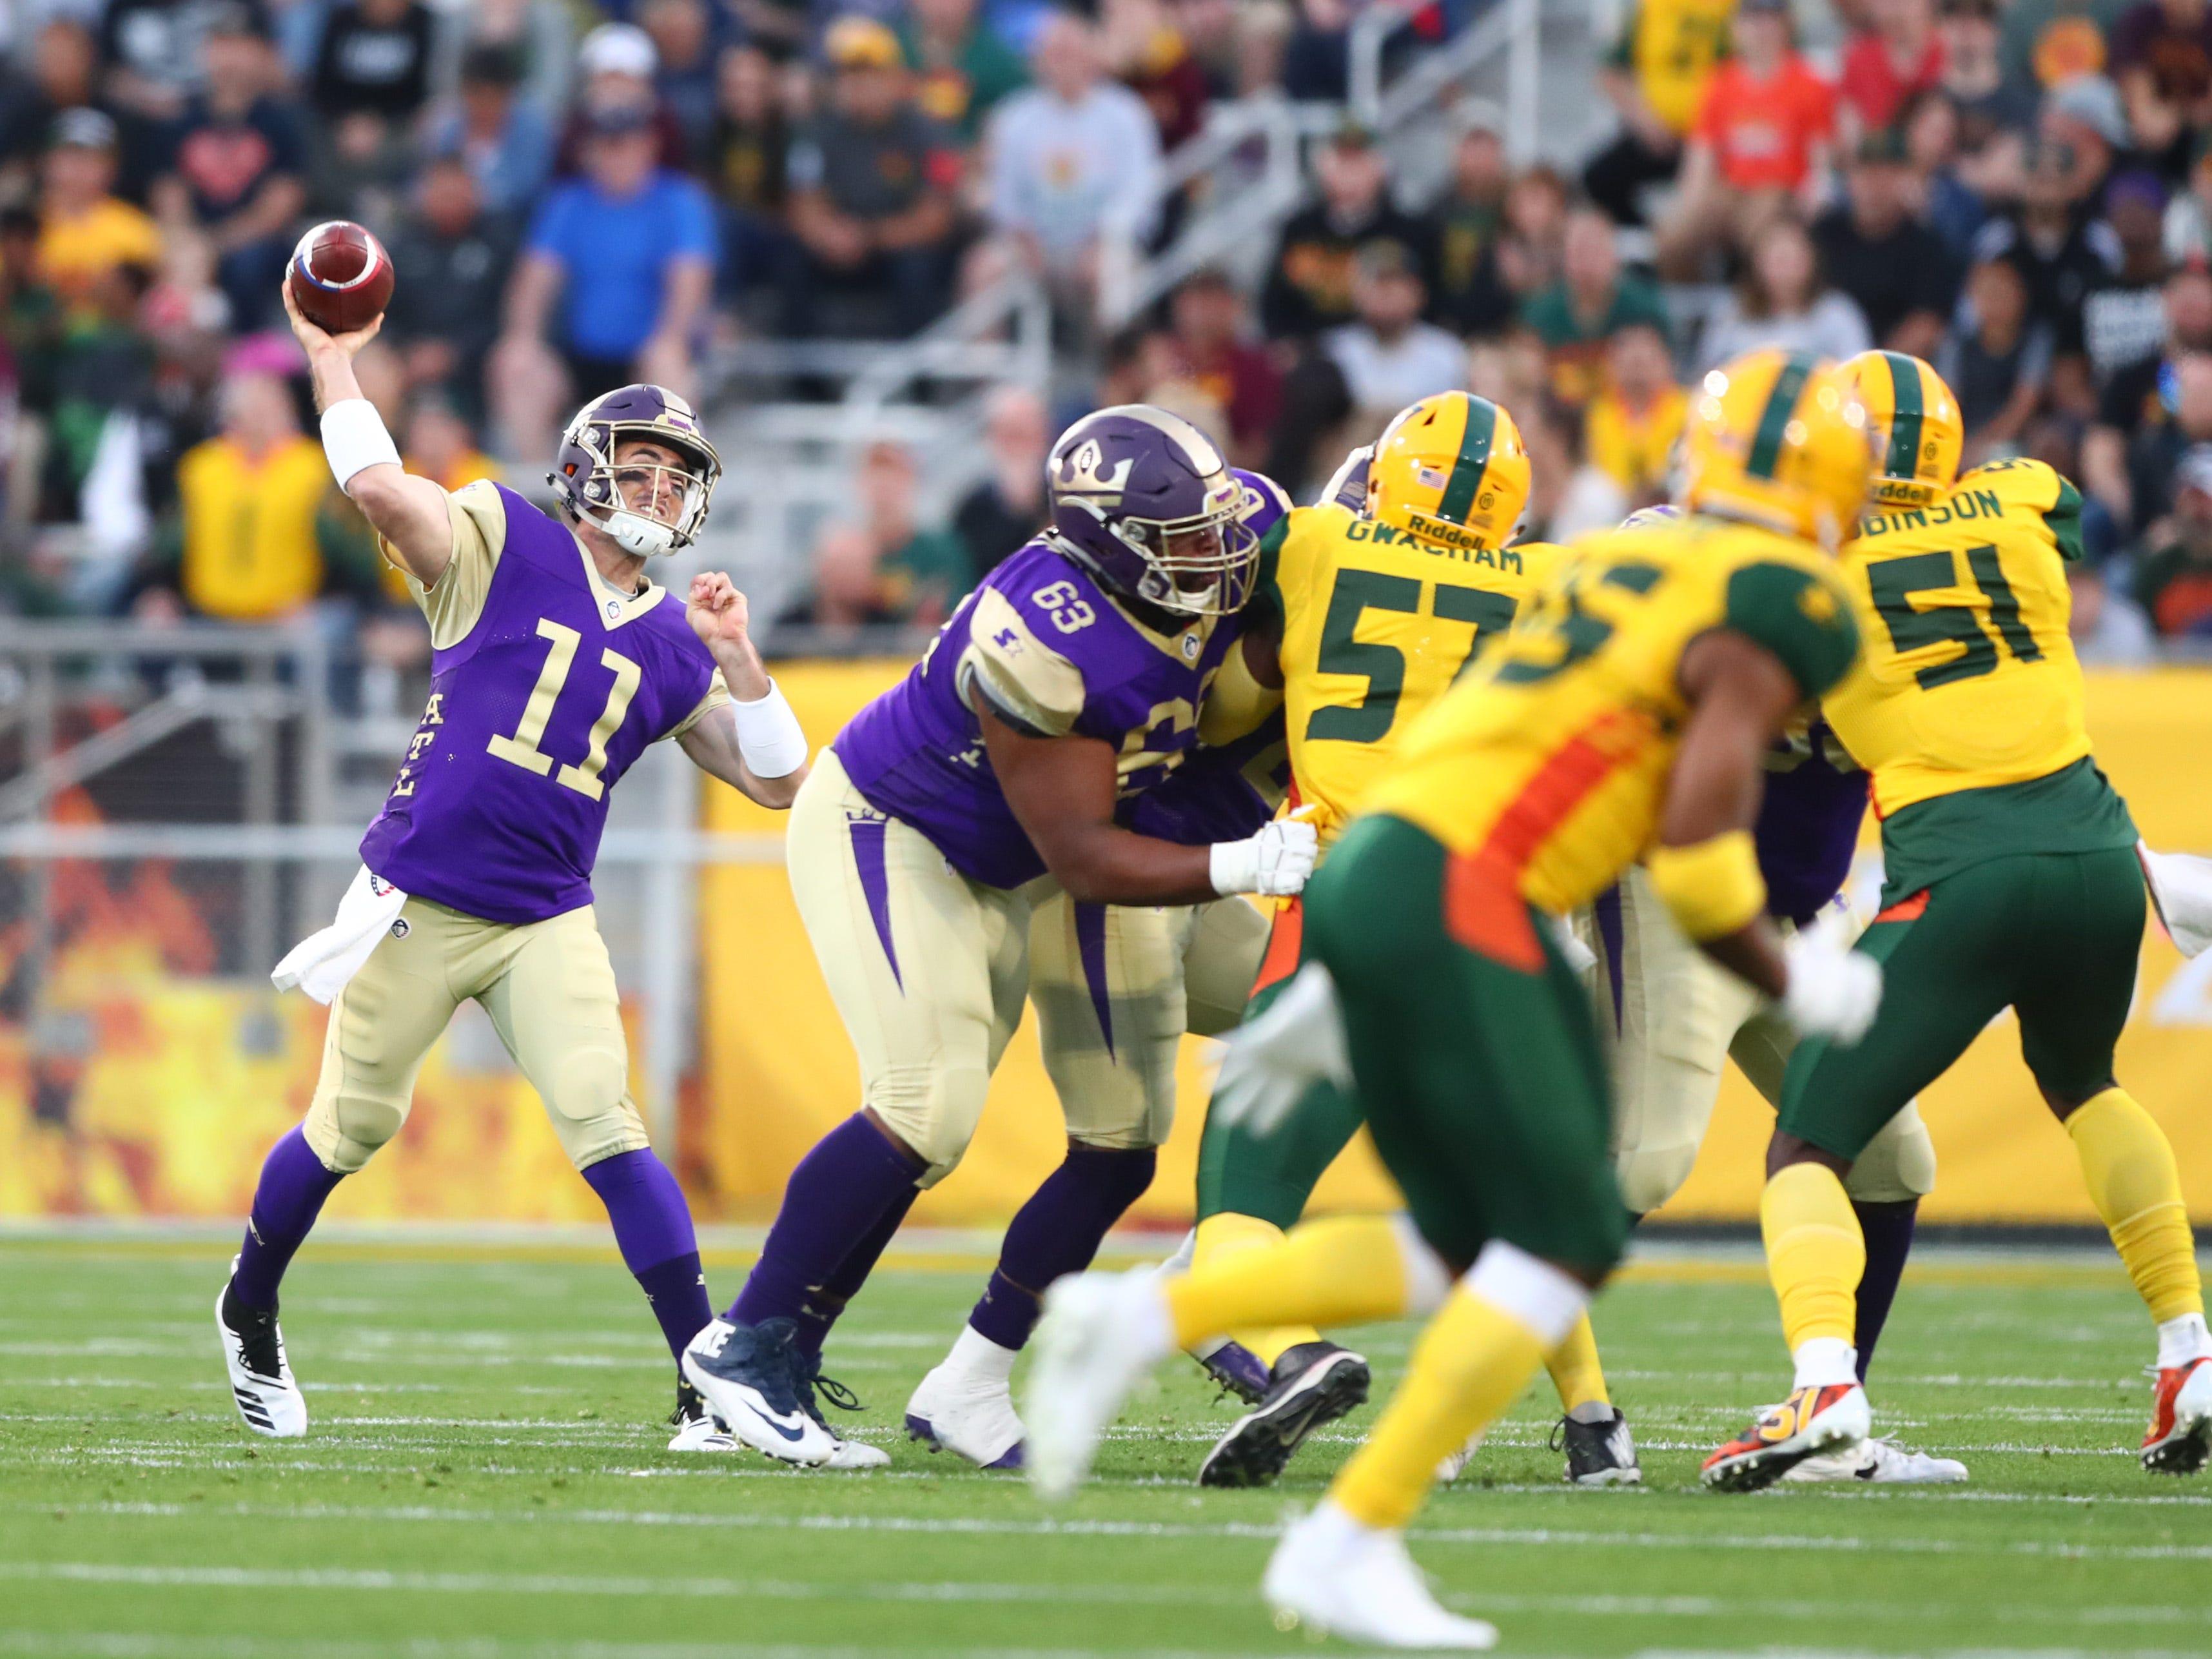 Mar 3, 2019; Tempe, AZ, USA; Atlanta Legends quarterback Aaron Murray (11) against the Arizona Hotshots during the first half of an AAF football game at Sun Devil Stadium.